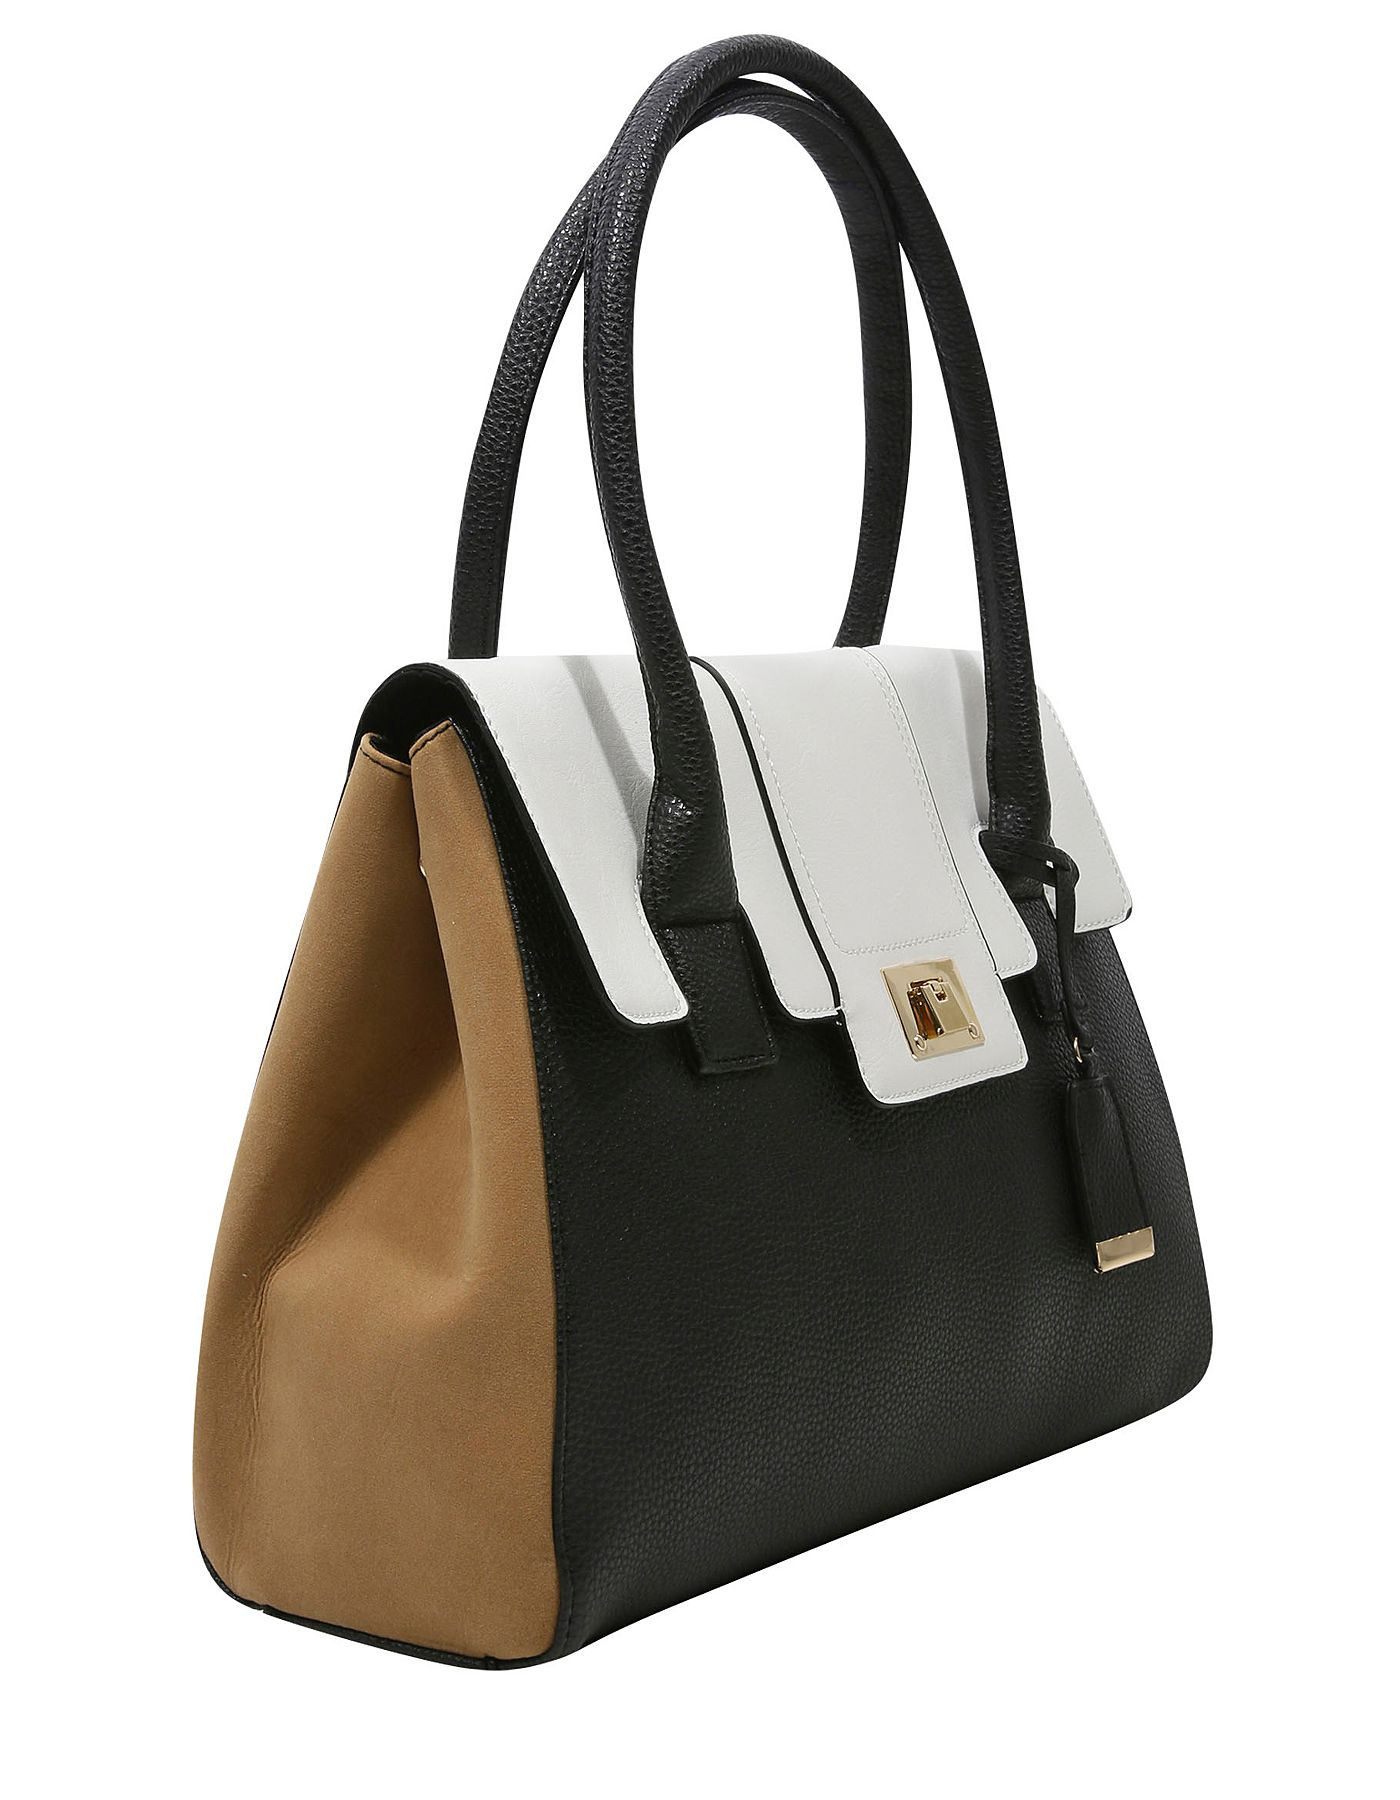 Fashion Tote Bag Women George At Asda